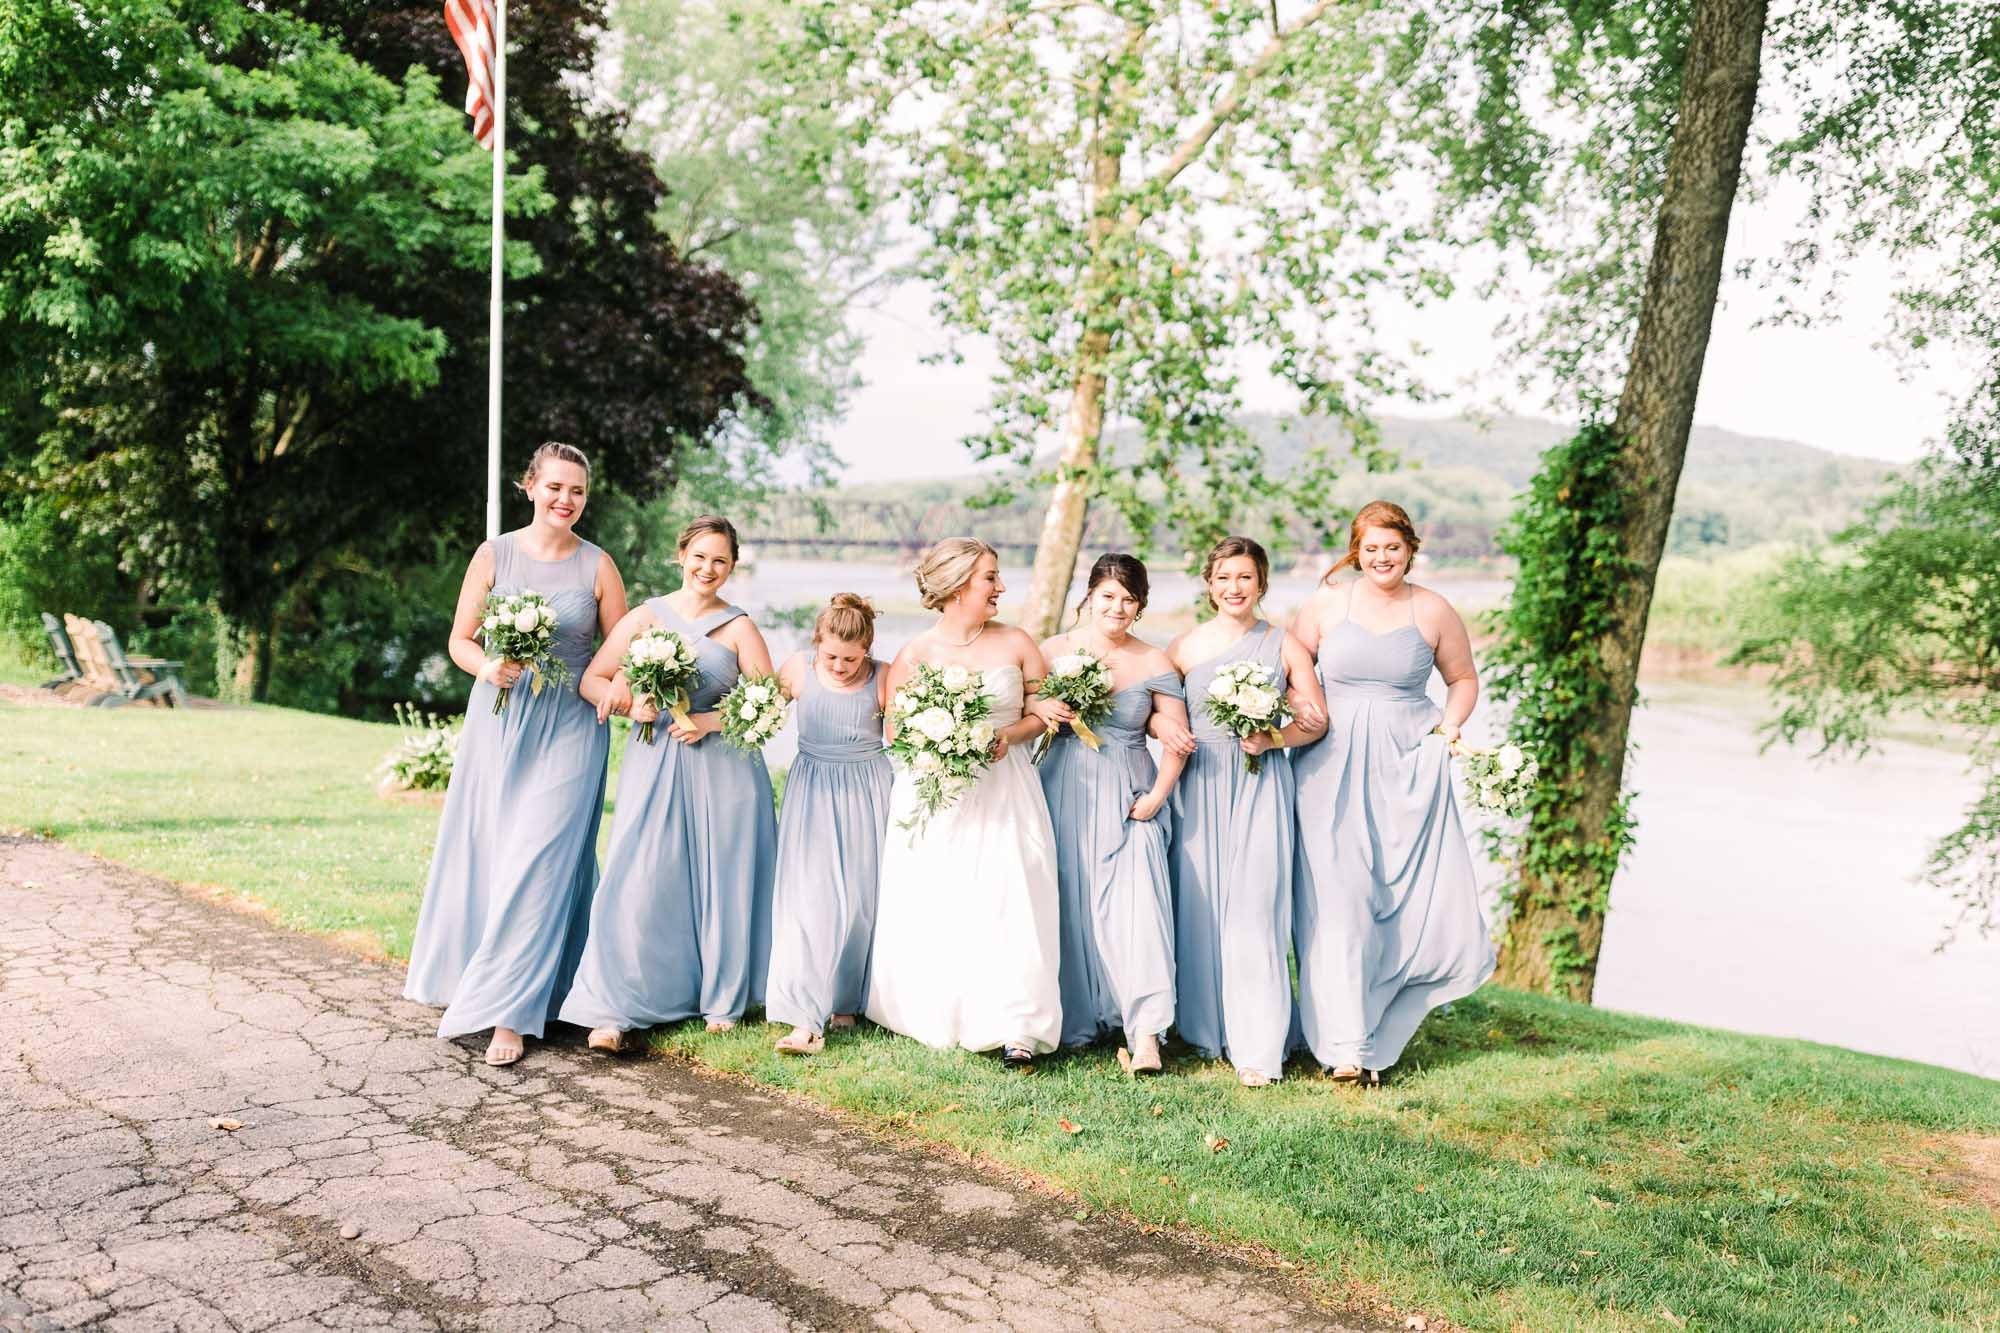 isle-of-que-wedding-6905.jpg